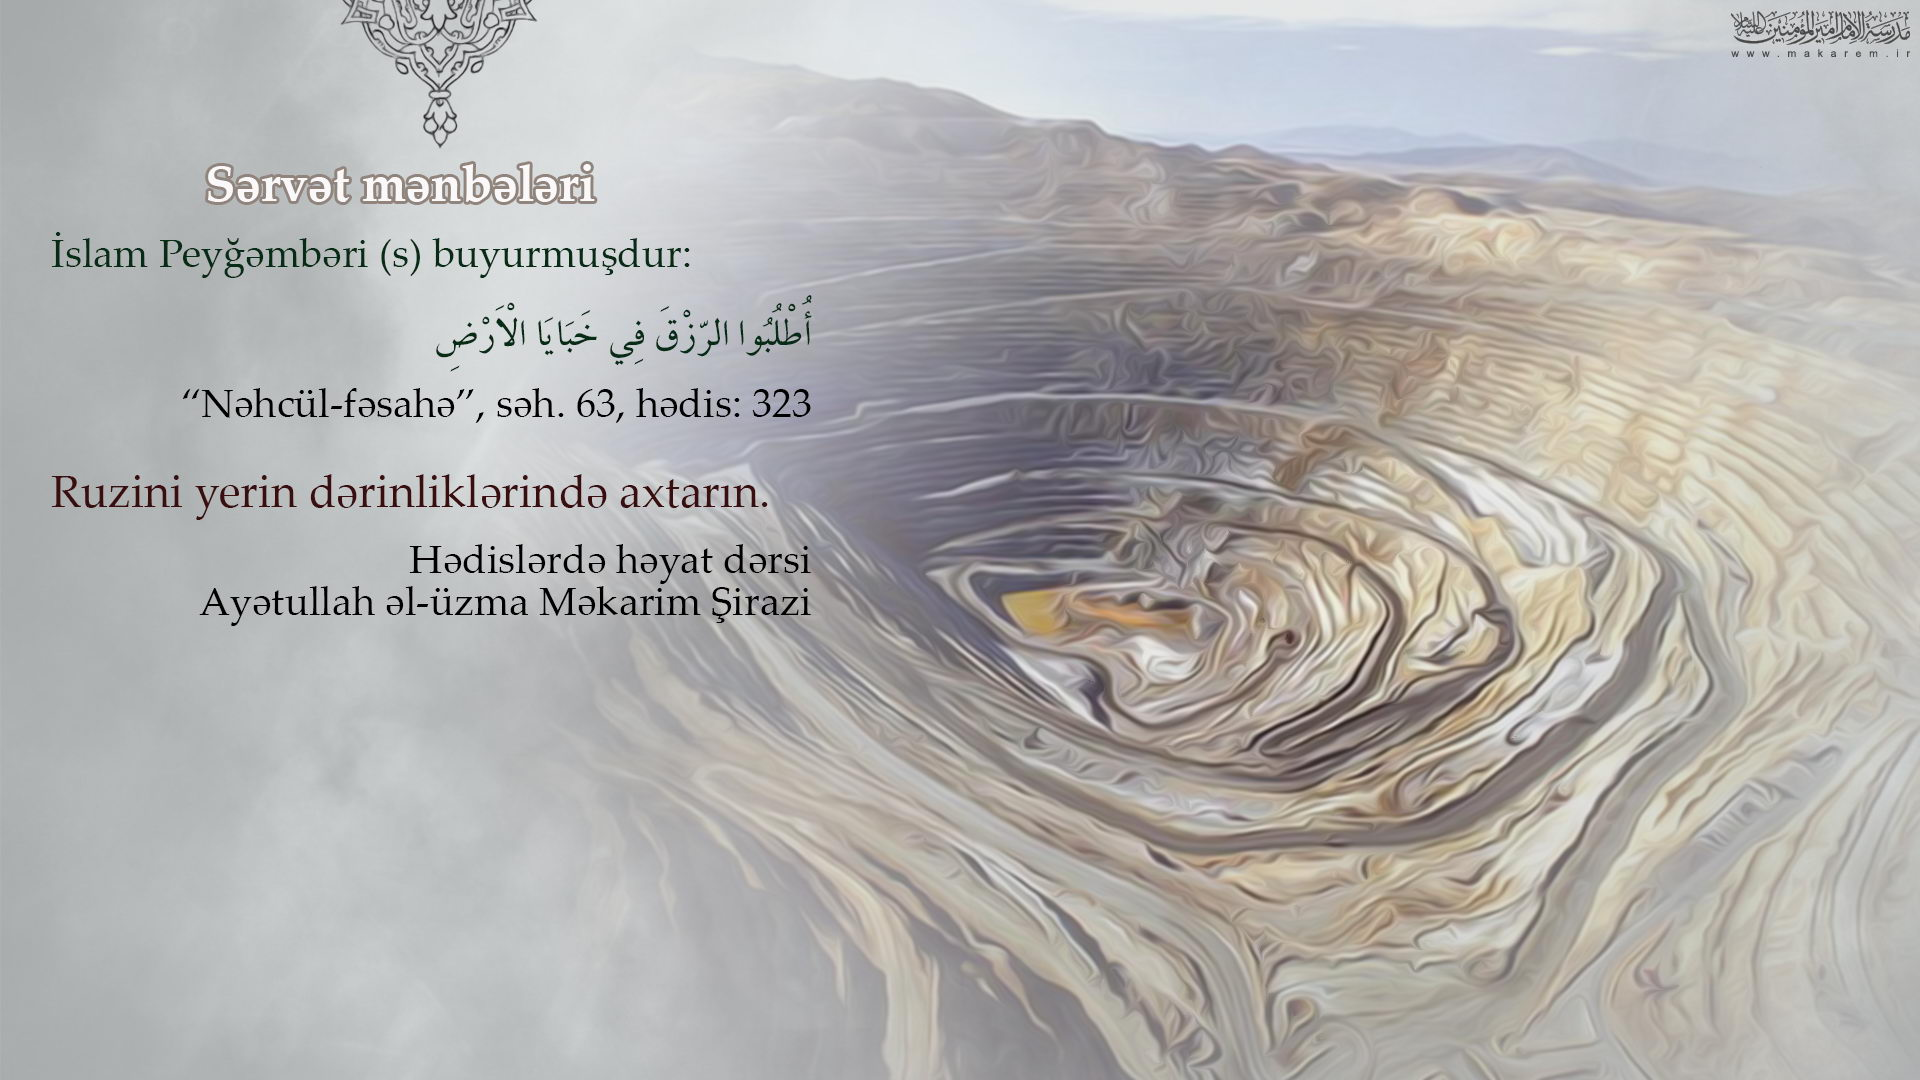 150-013-مدرسه الامام امیر المومنین (ع)